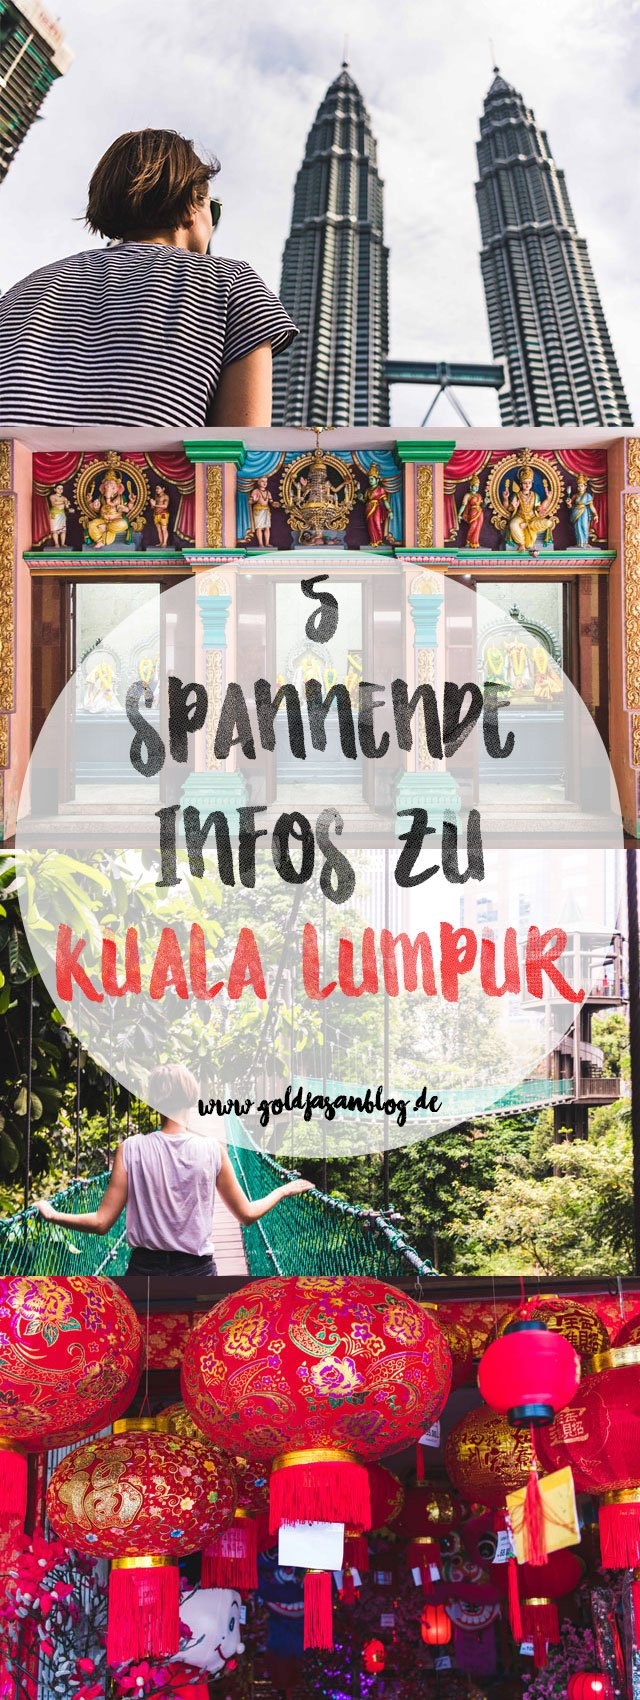 Collage mit Infos zu Kuala Lumpur